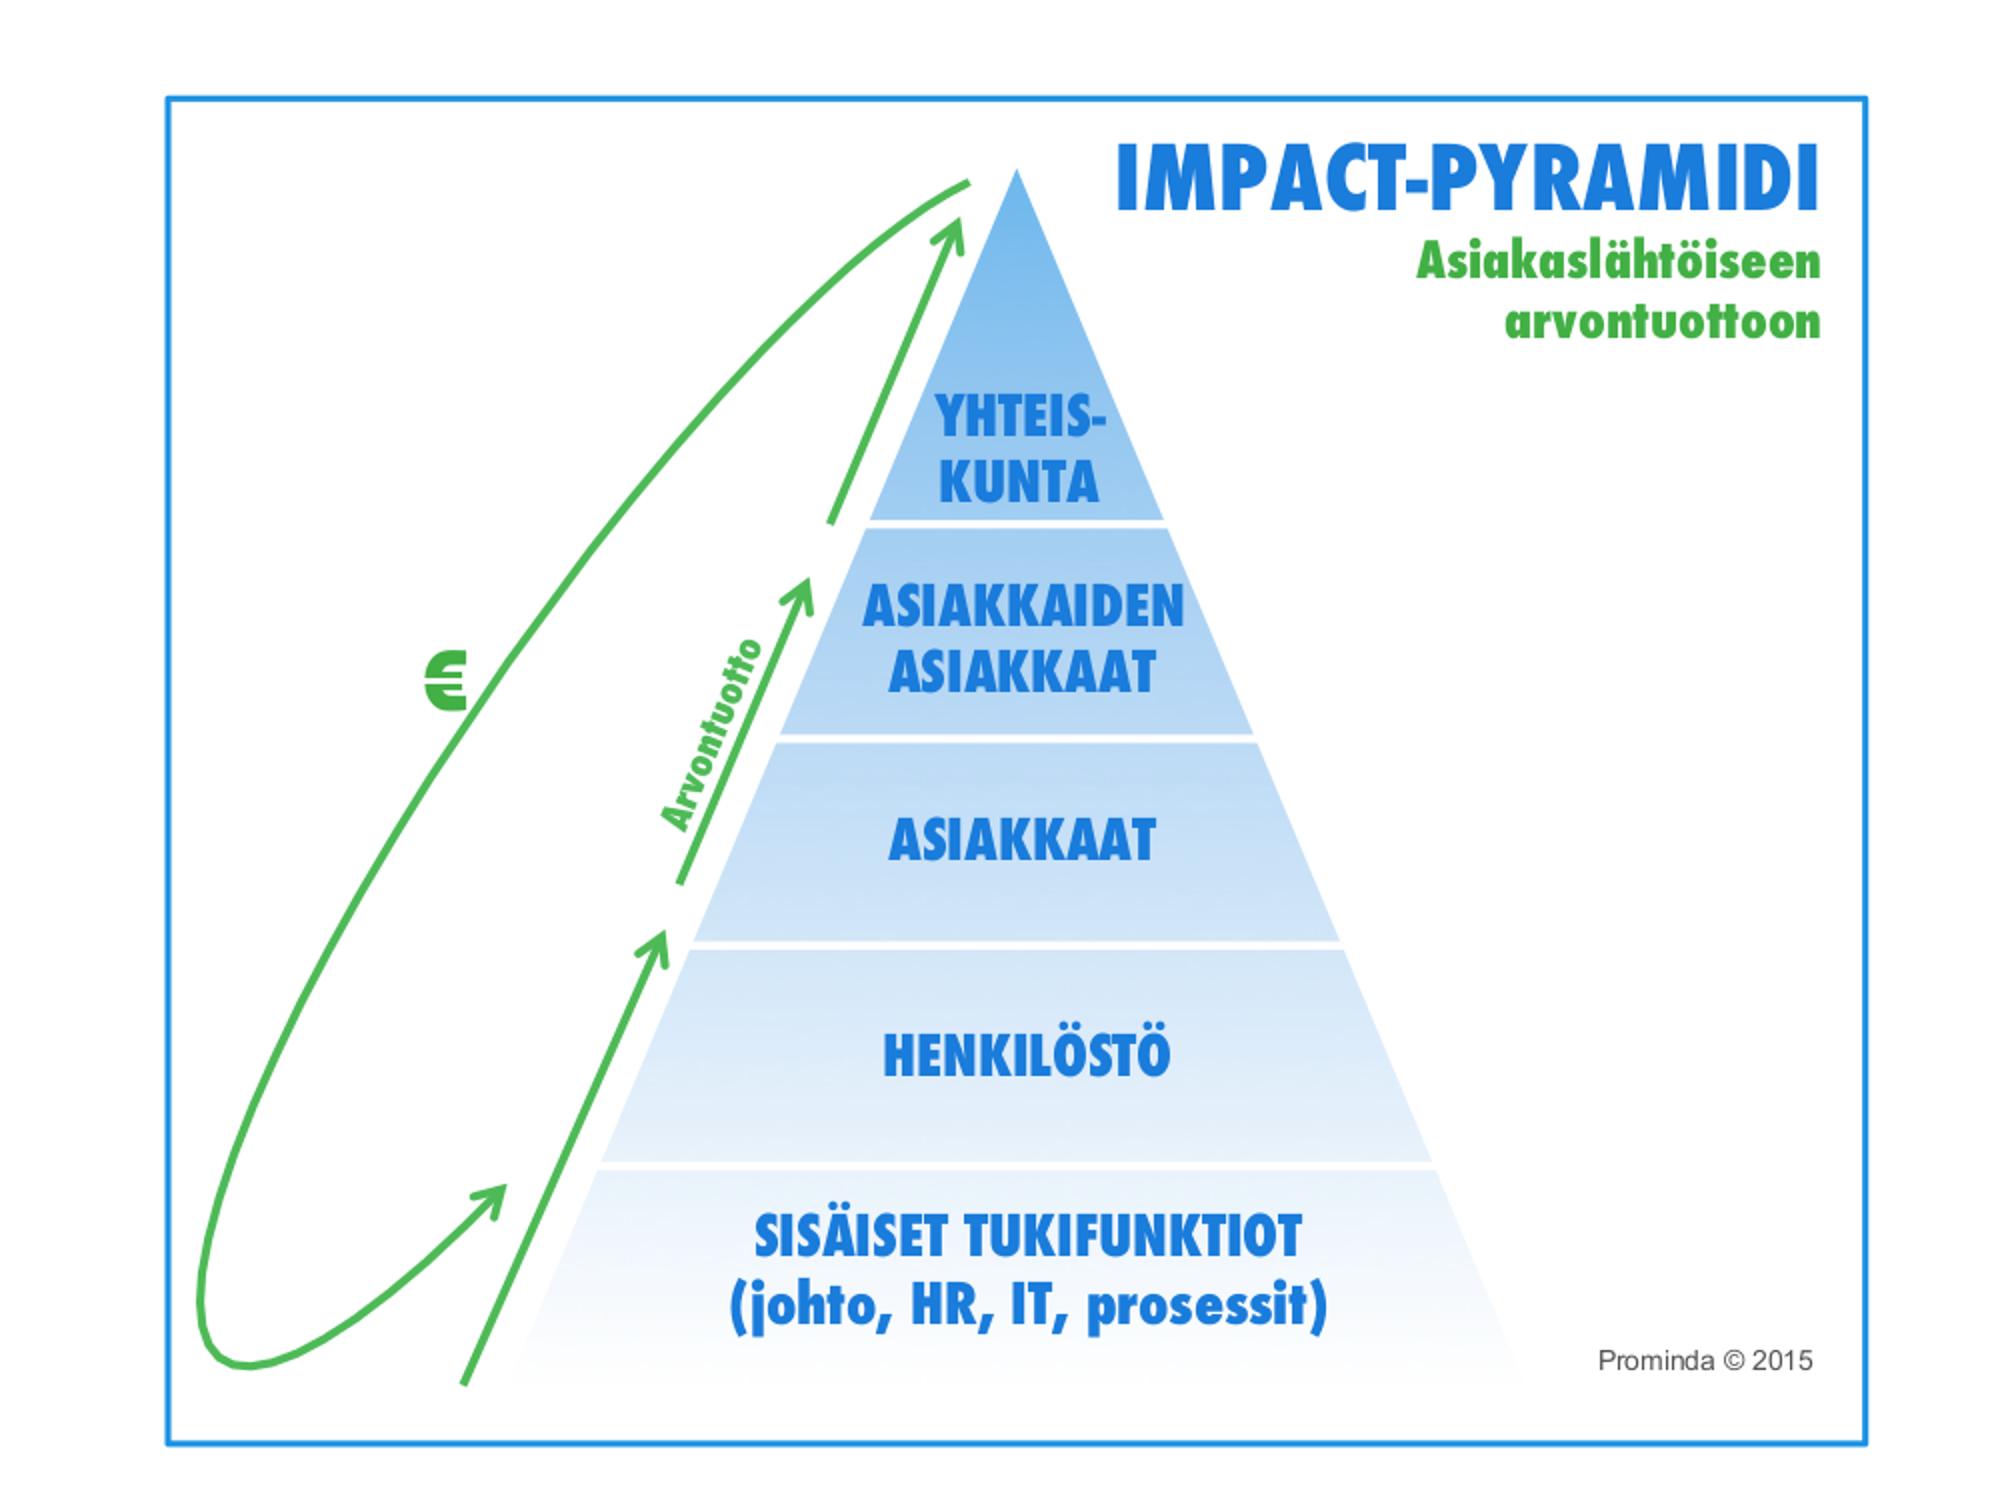 impact-pyramidi